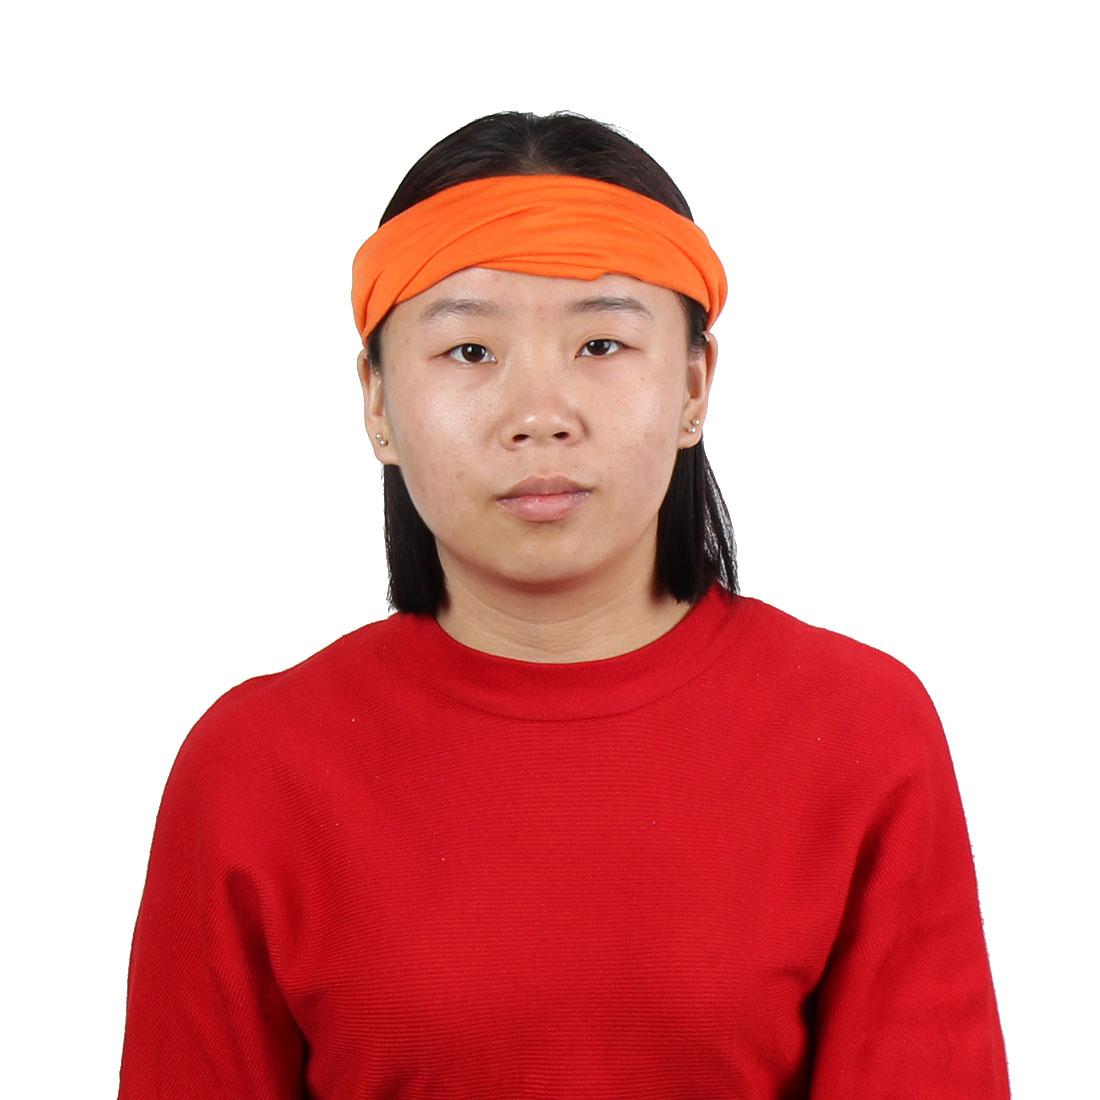 Outdoor Sports Cotton Blends Elastic Headwraps Headband Hair Band